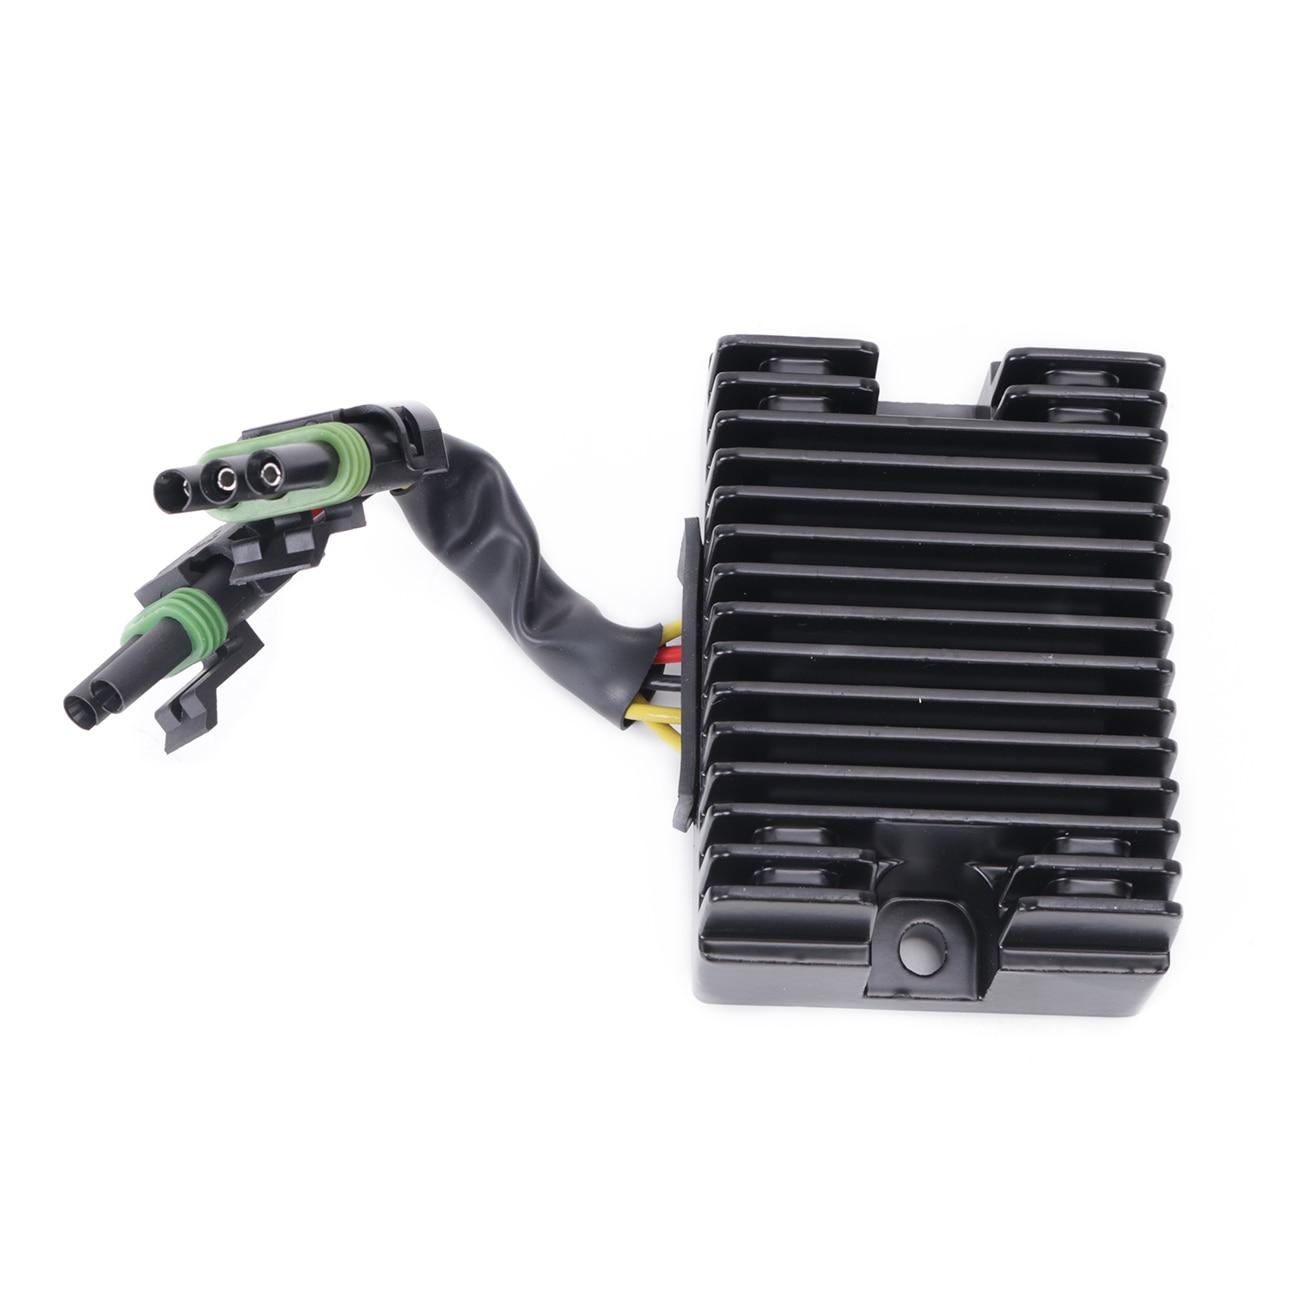 Motorcycle voltage regulator rectifier for seadoo 278001241 278001554 sportster xp gsx gtx gti lrv gtx rfi di motorbike m021 c 5 in motorbike ingition from